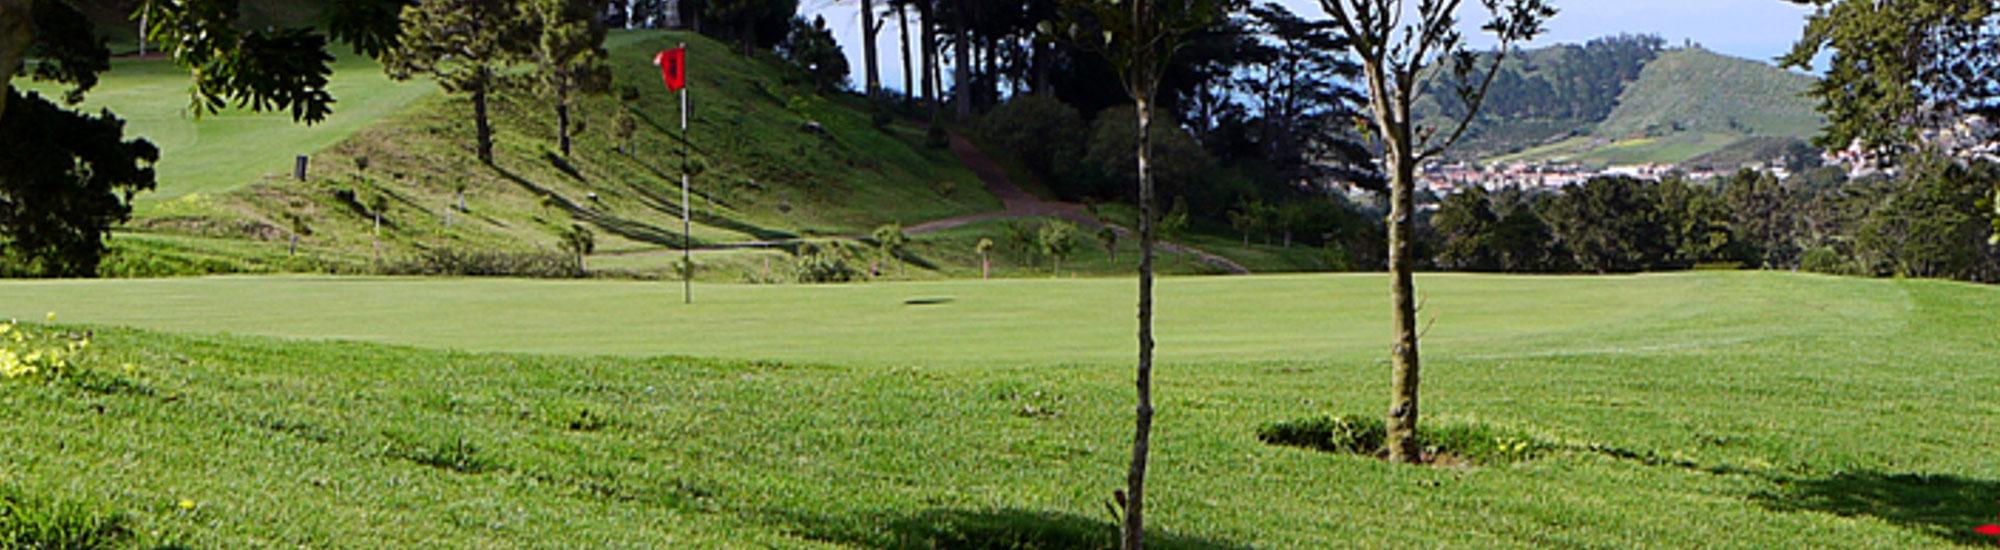 itinerario neofita golf